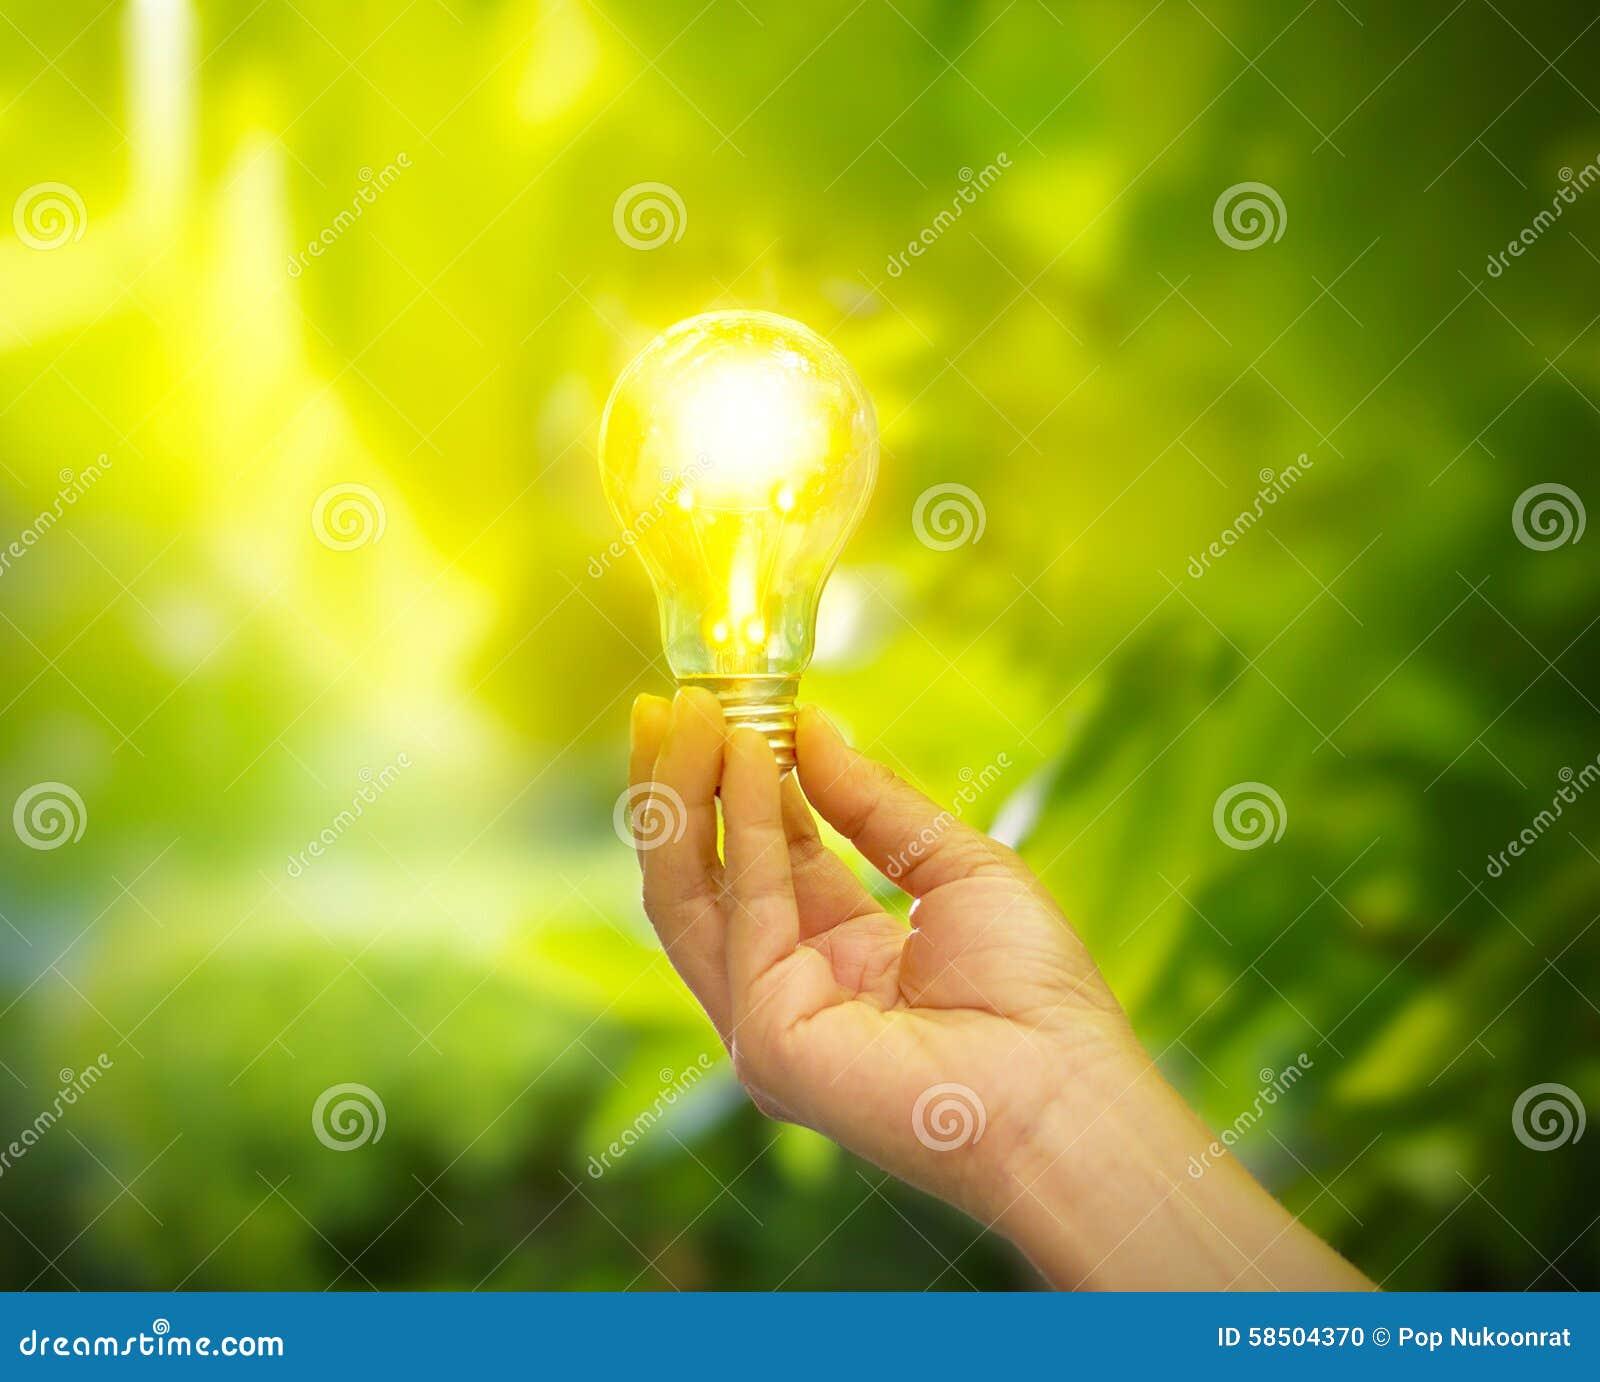 Light Bulb Wallpaper: Hand Holding A Light Bulb With Energy On Fresh Green